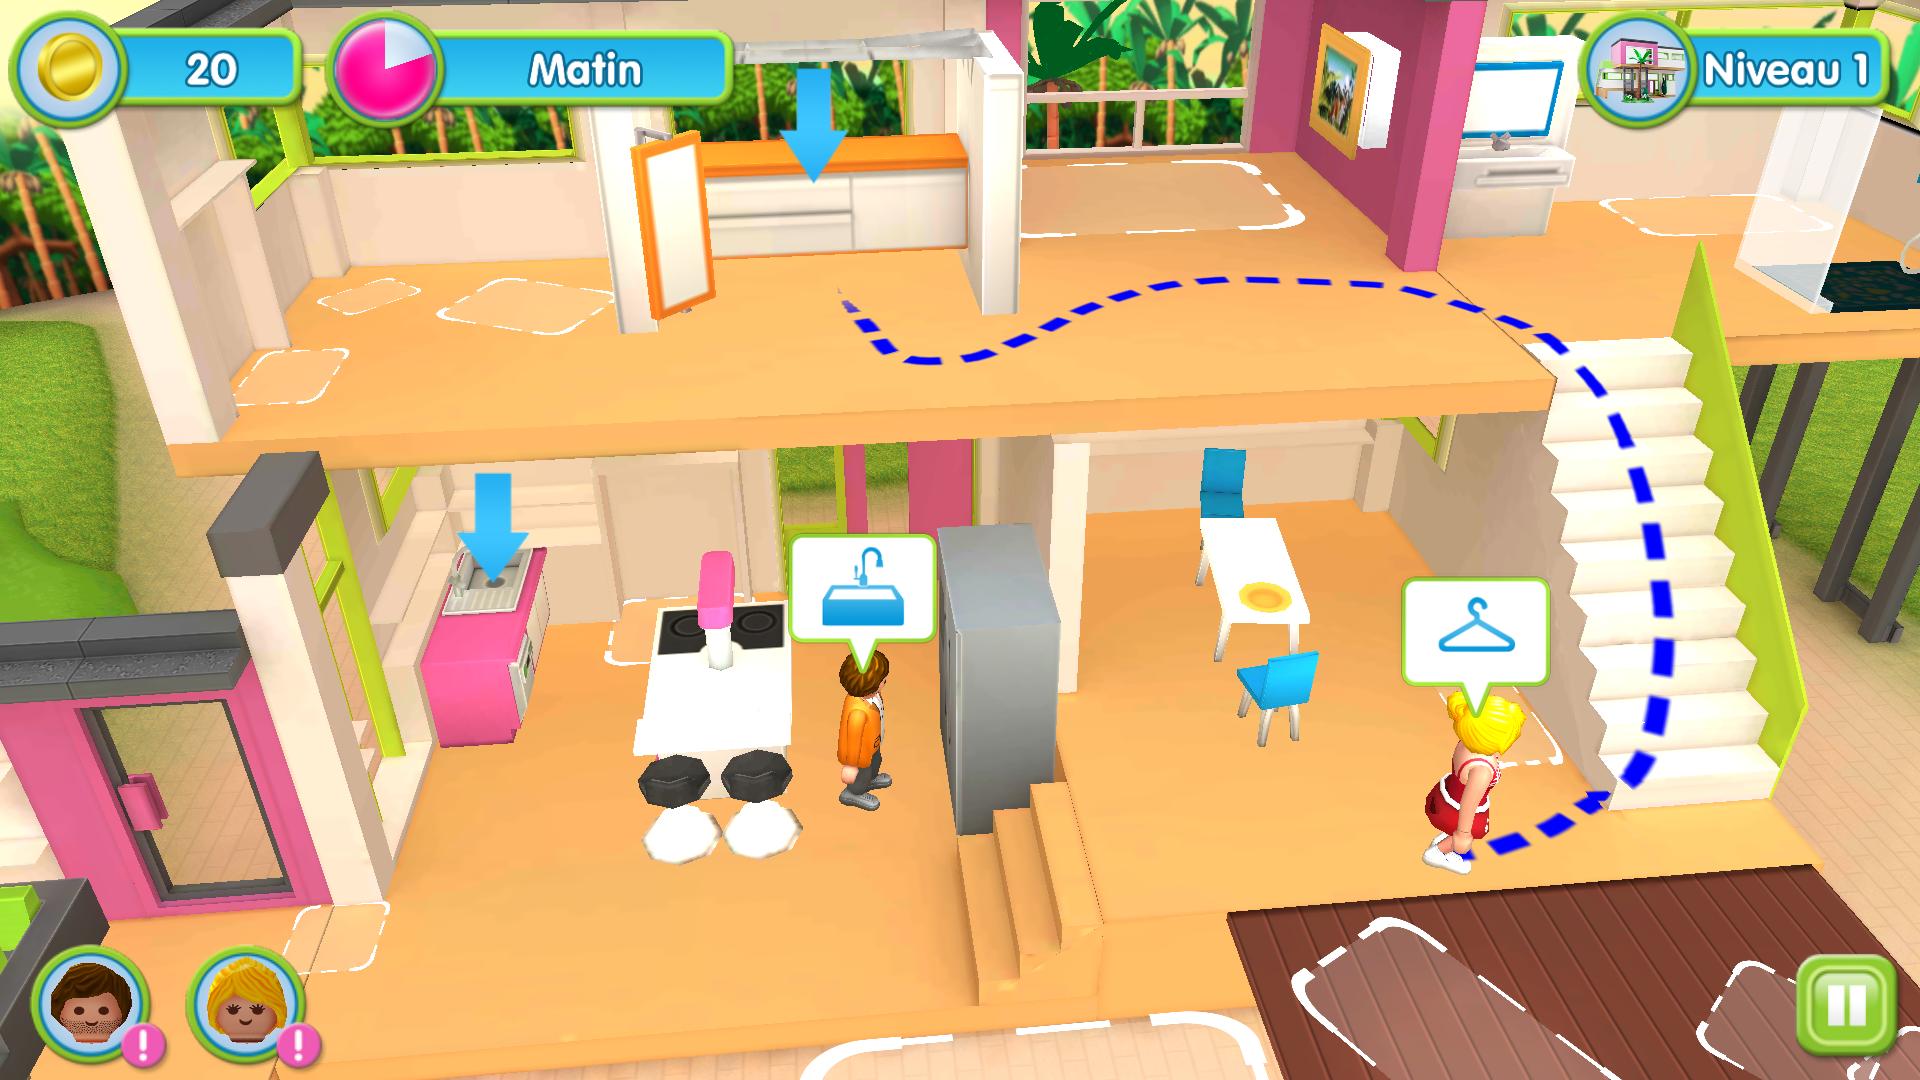 Playmobil Maison Moderne 2014 : La maison moderne playmobil android test photos